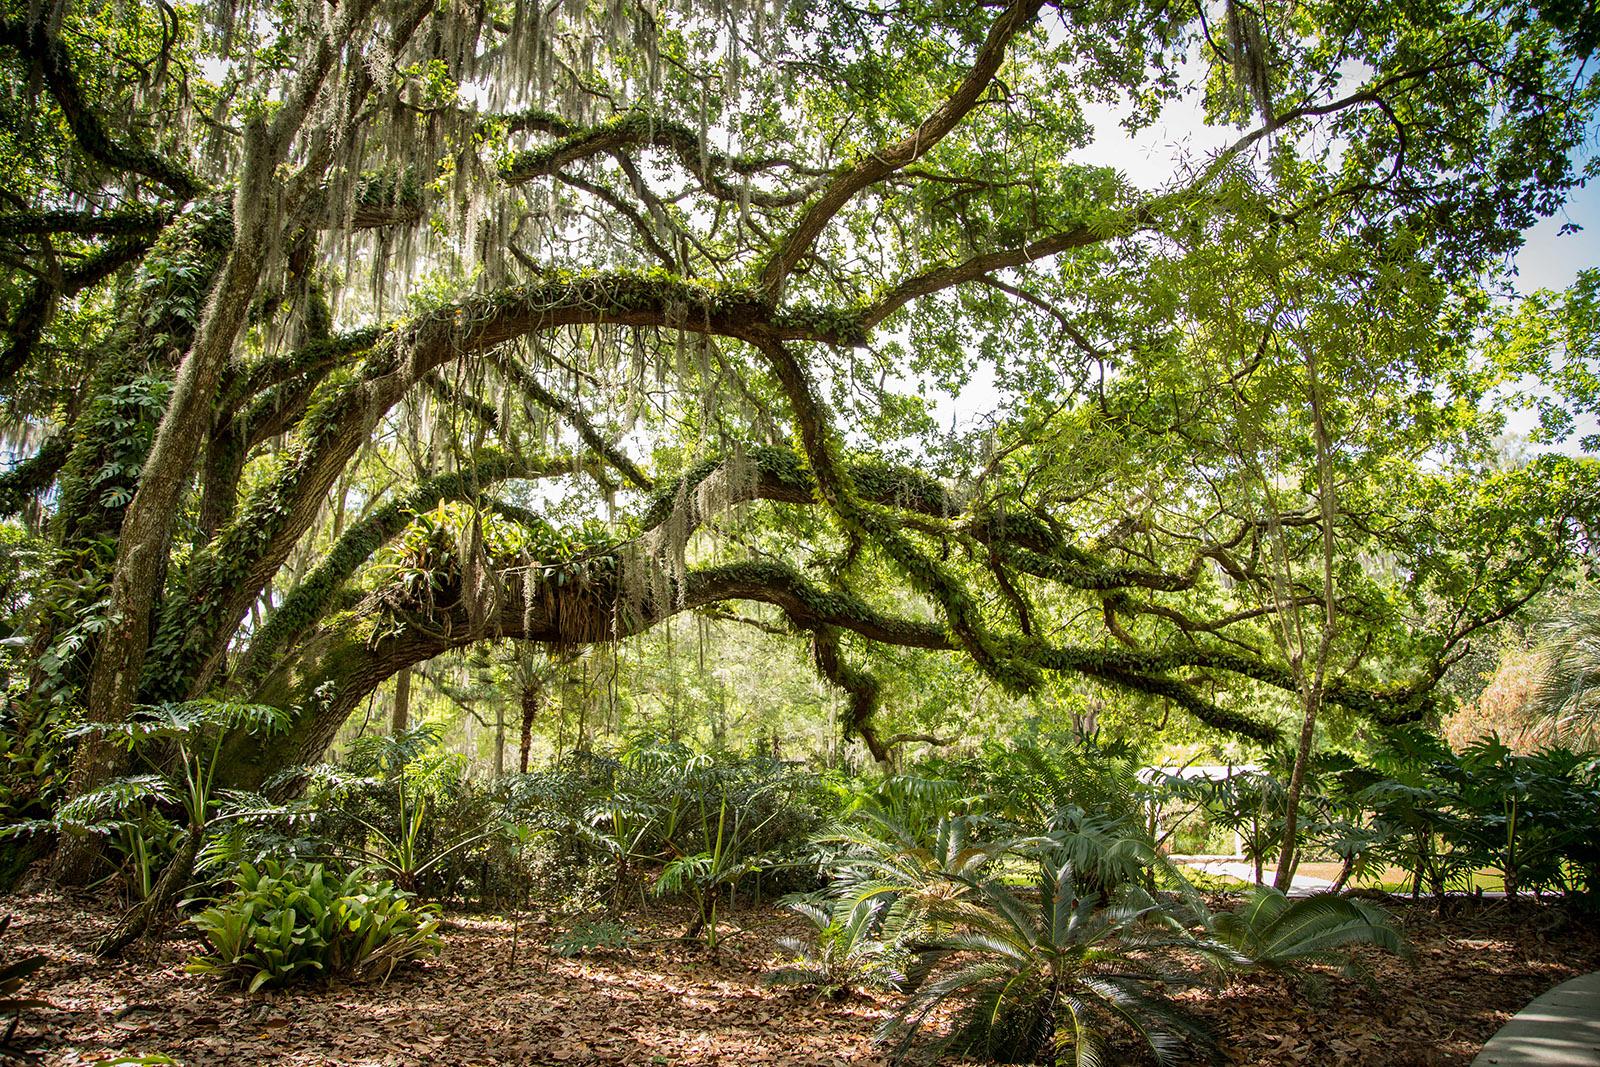 Hillsborough county eureka springs conservation park - Independence rv winter garden florida ...